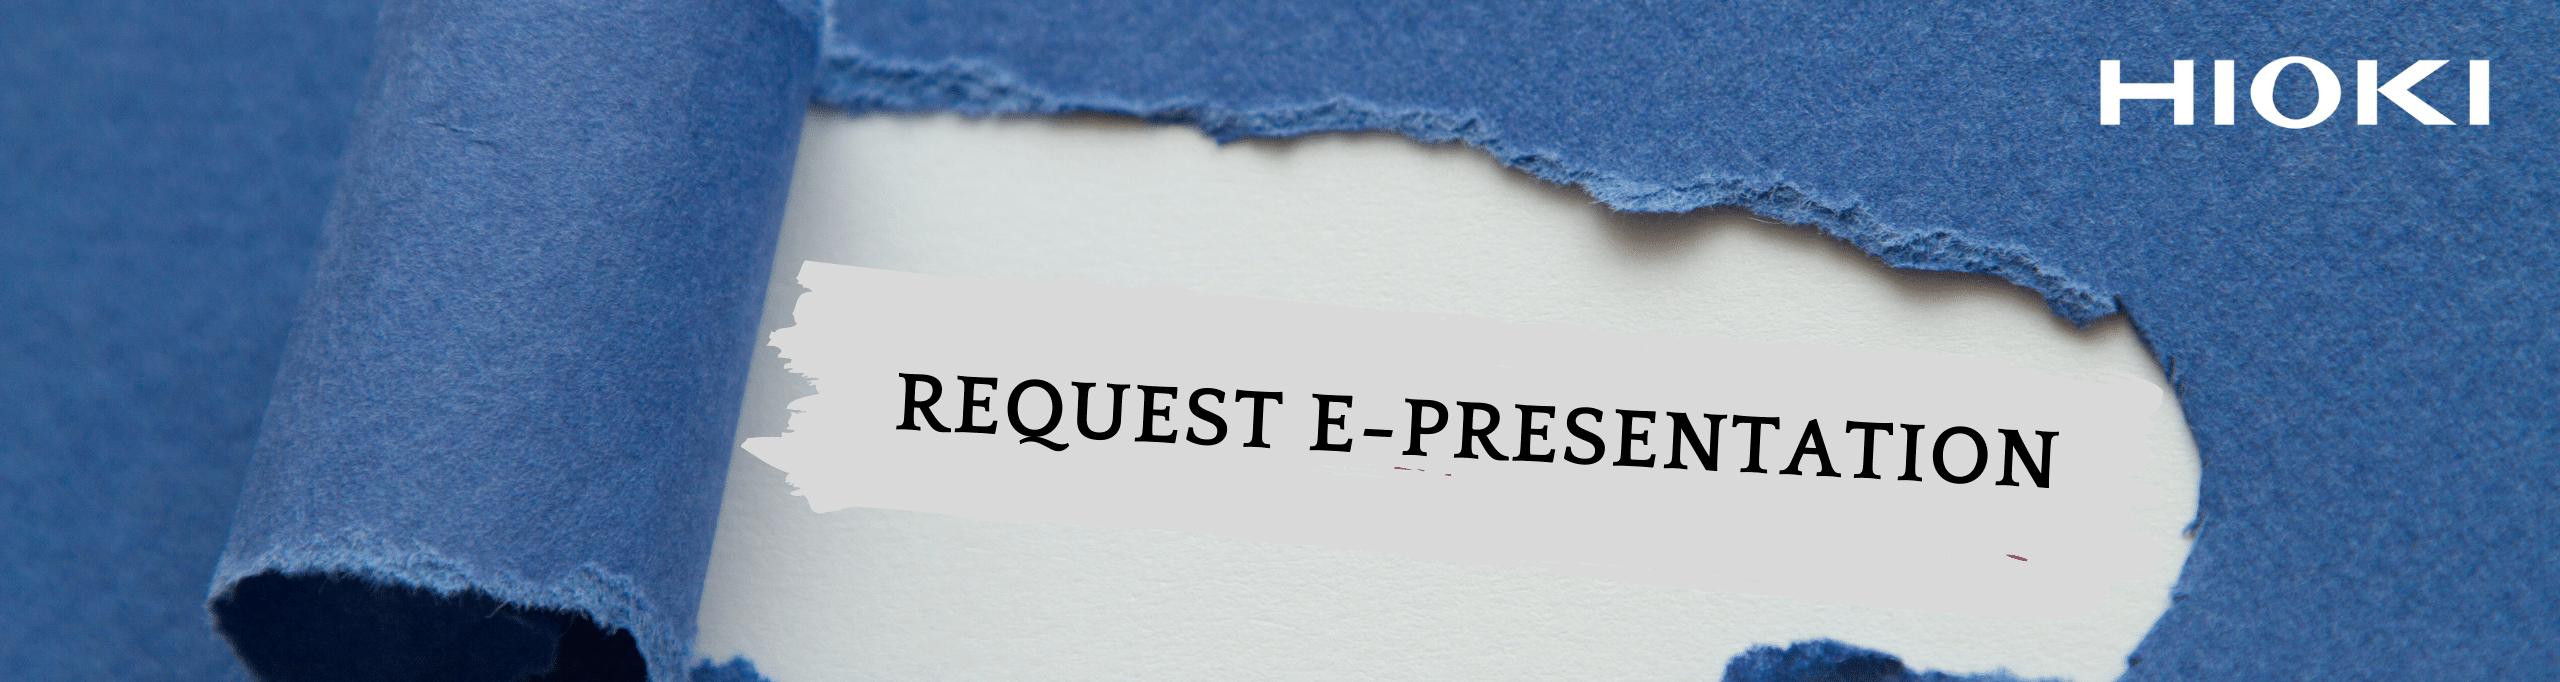 Request e-presentation